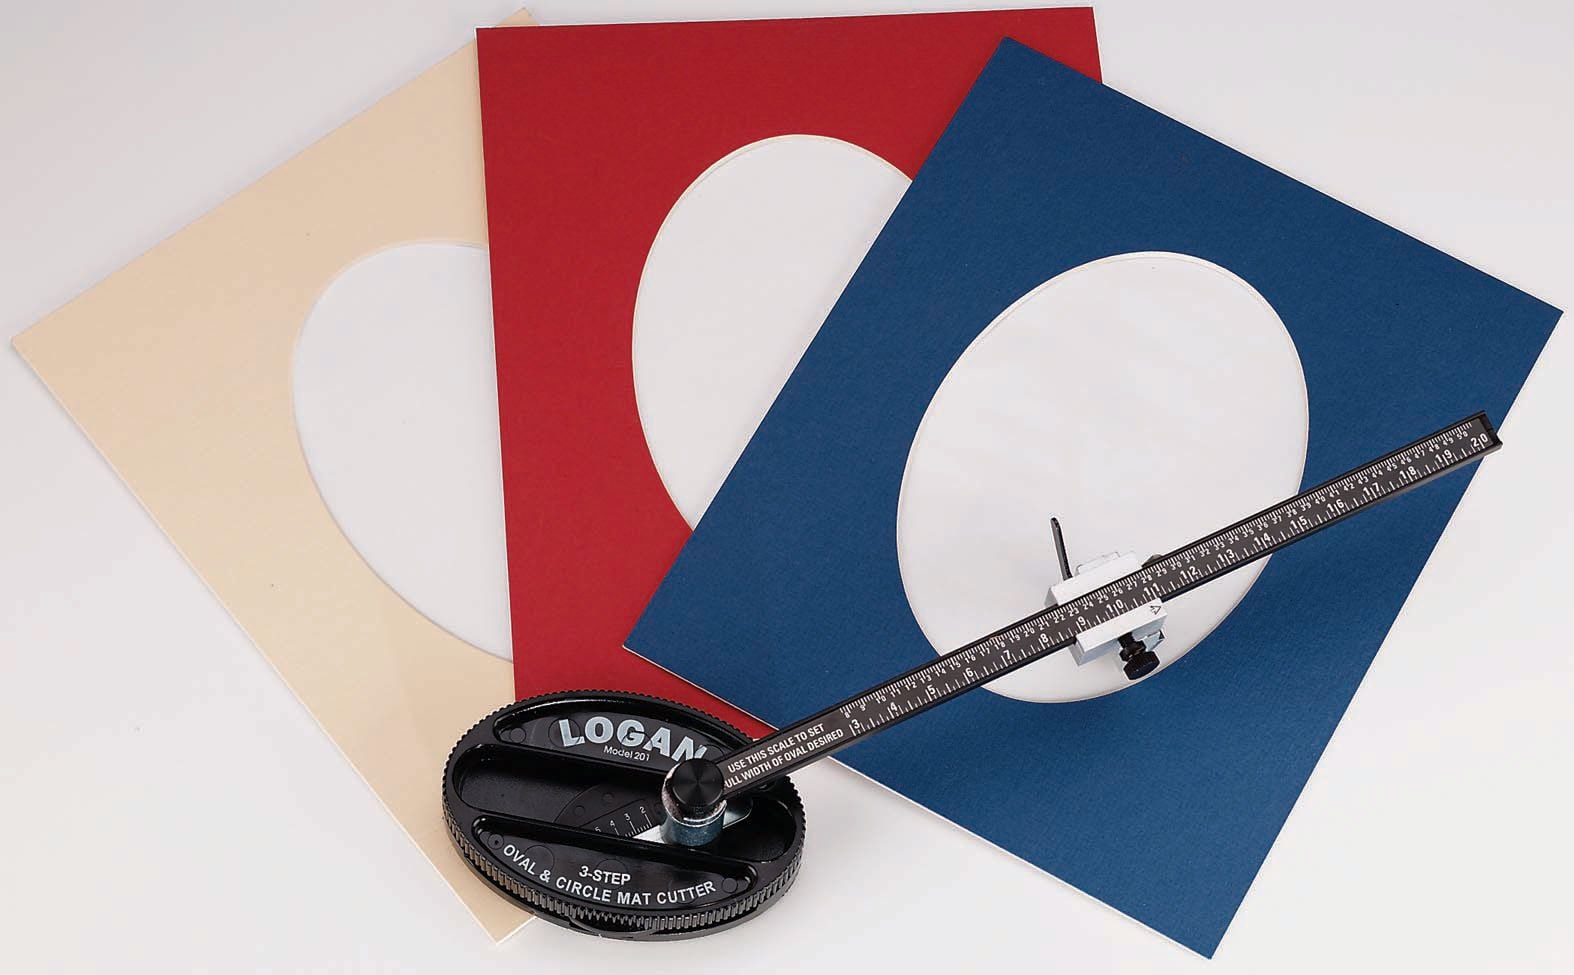 Logan Model 201 Oval & Circle Mat Cutter